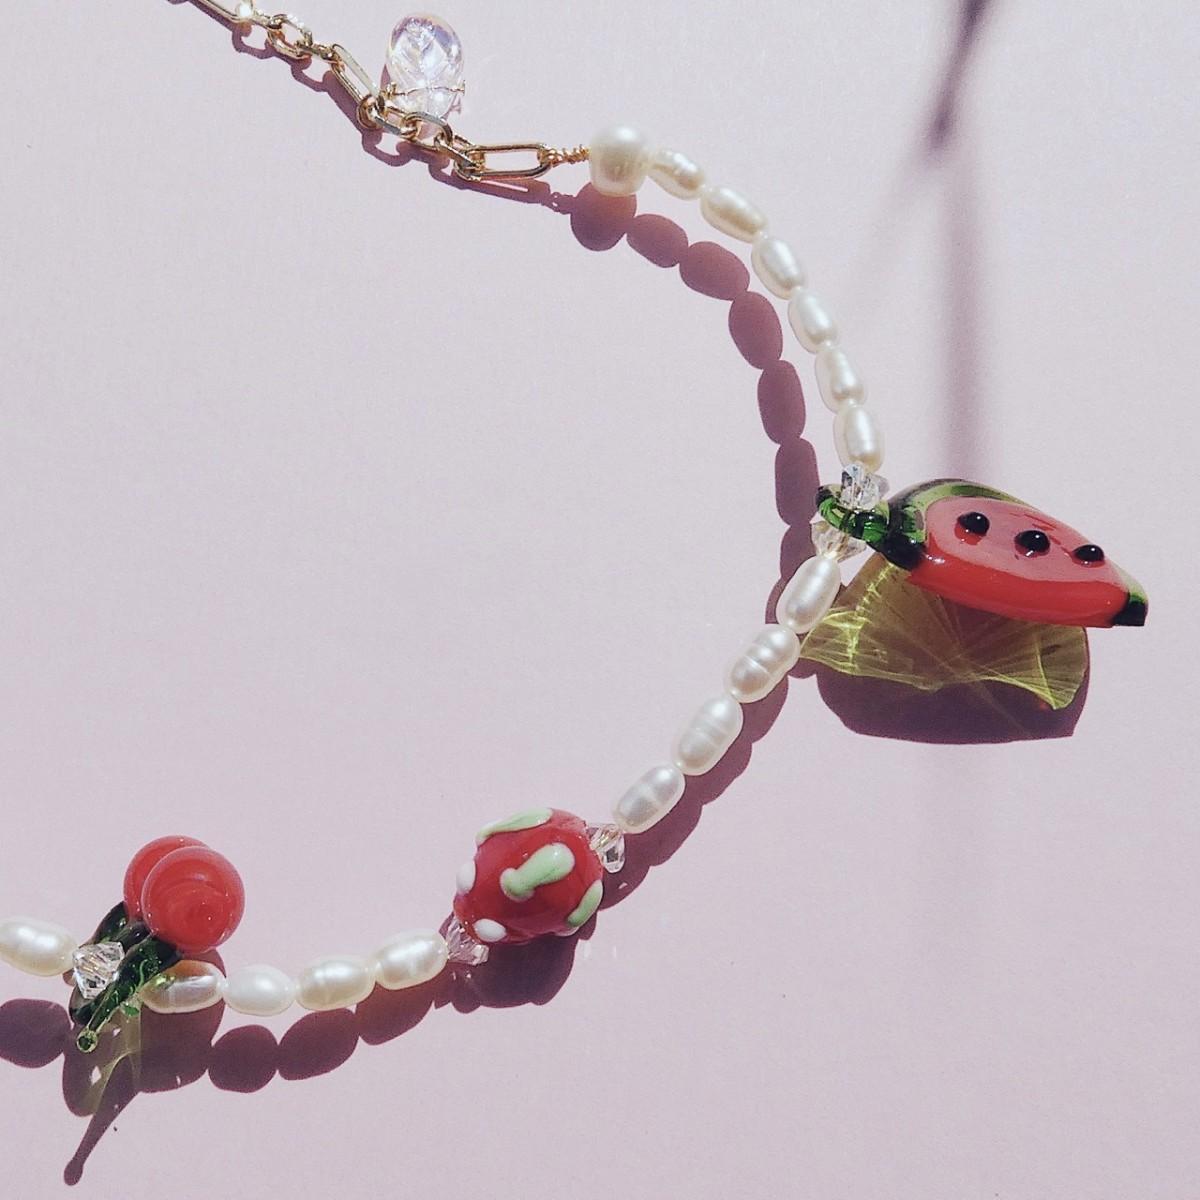 Valerie Chic - HAPPY RED FRUITS Perlen Kette - 18 Karat vergoldet, 1 Kette 2 Stile